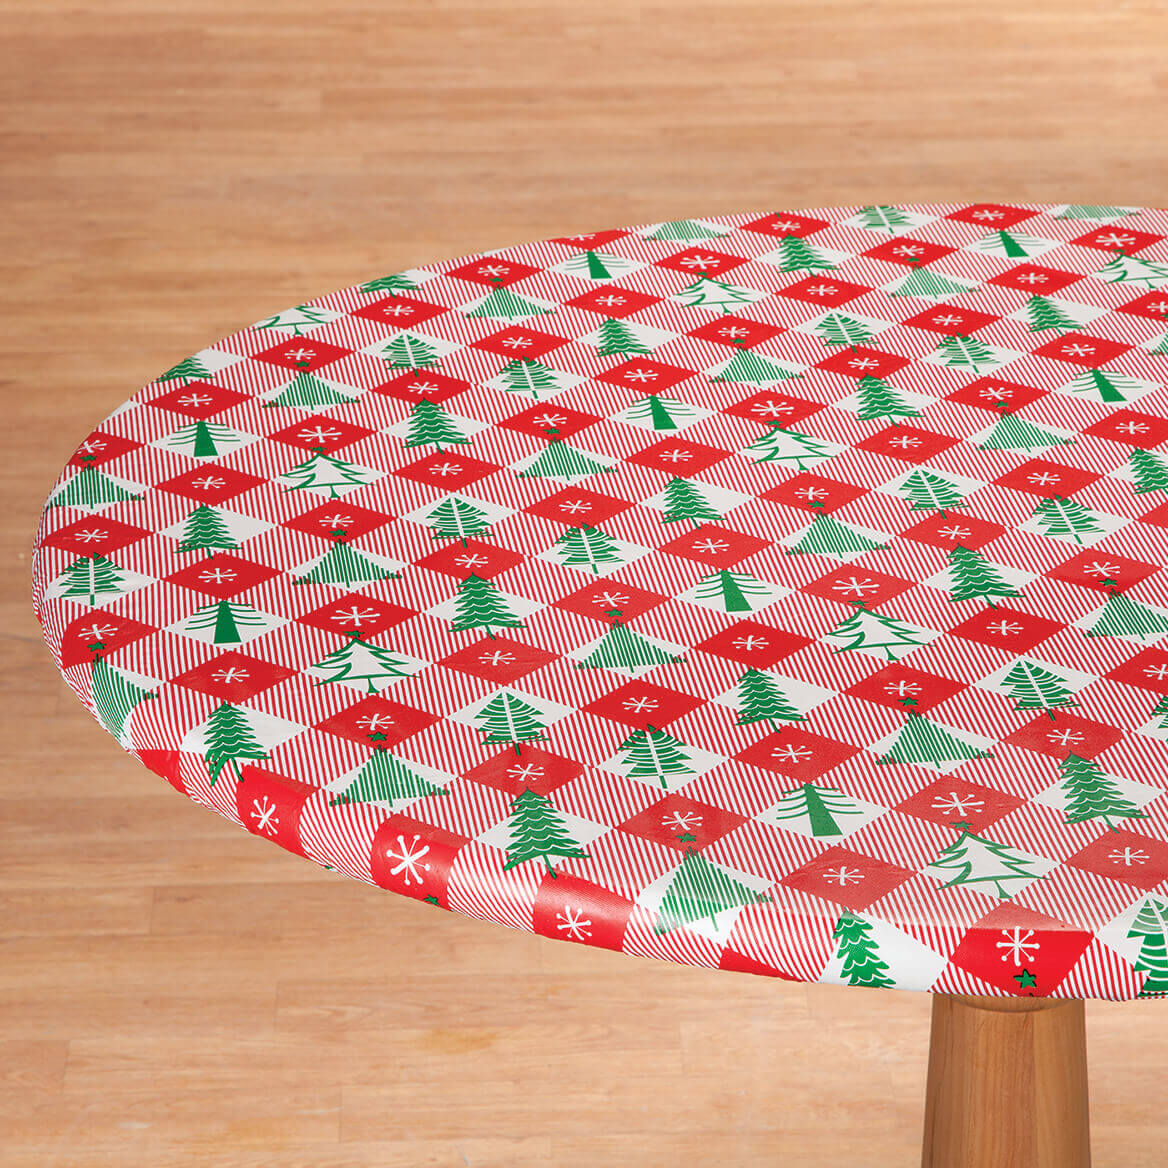 Vintage Holiday Tree Elasticized Vinyl Tablecover-368354